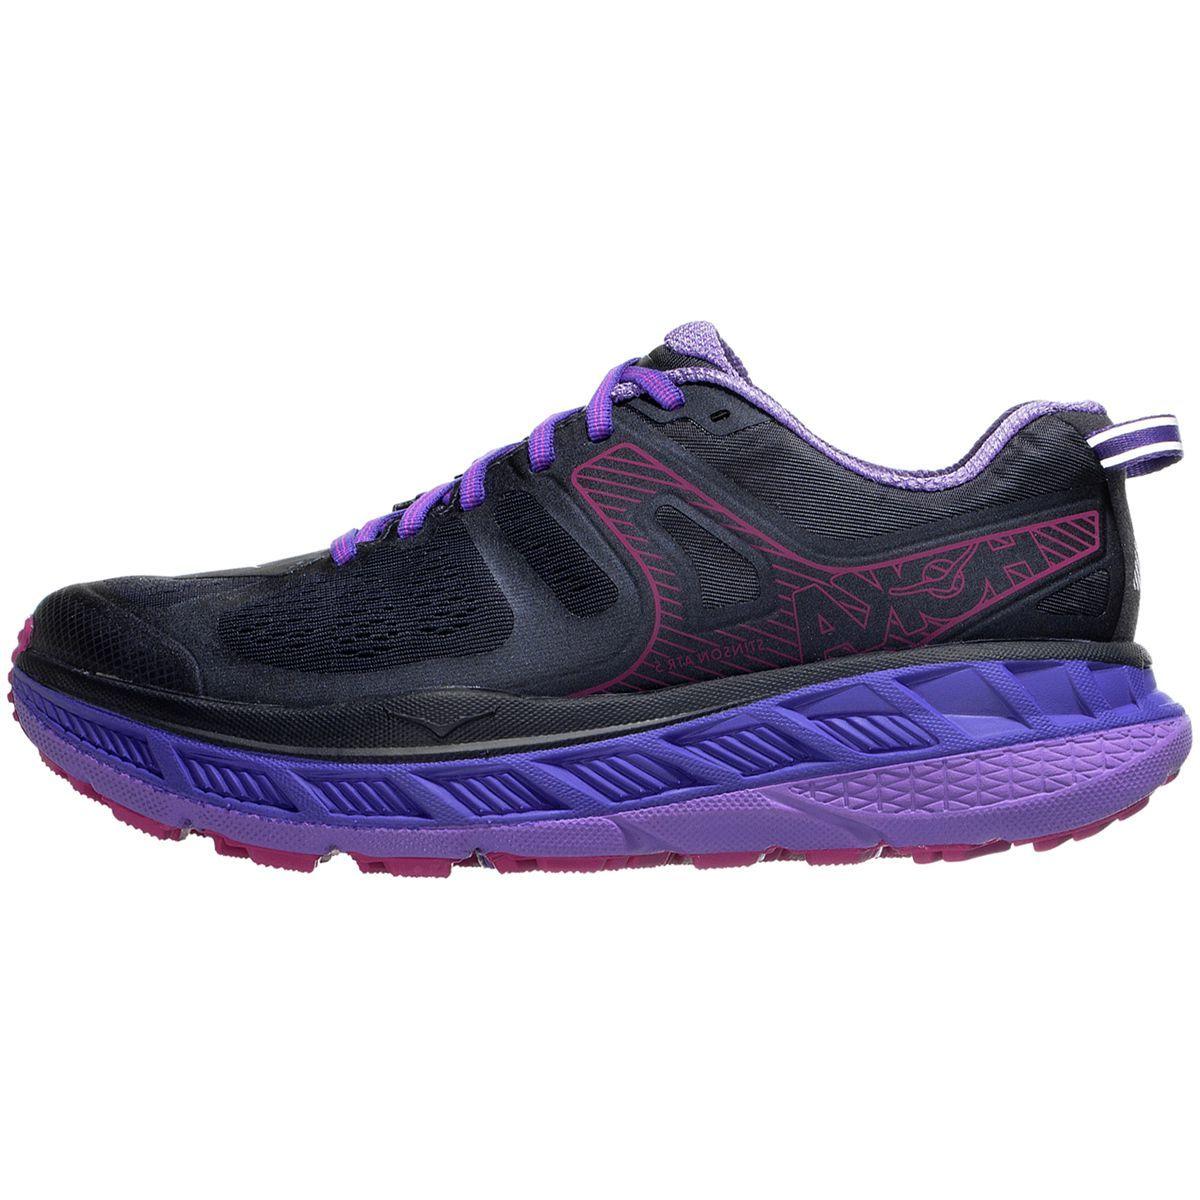 HOKA ONE ONE Stinson ATR 5 Trail Running Shoe - Women's